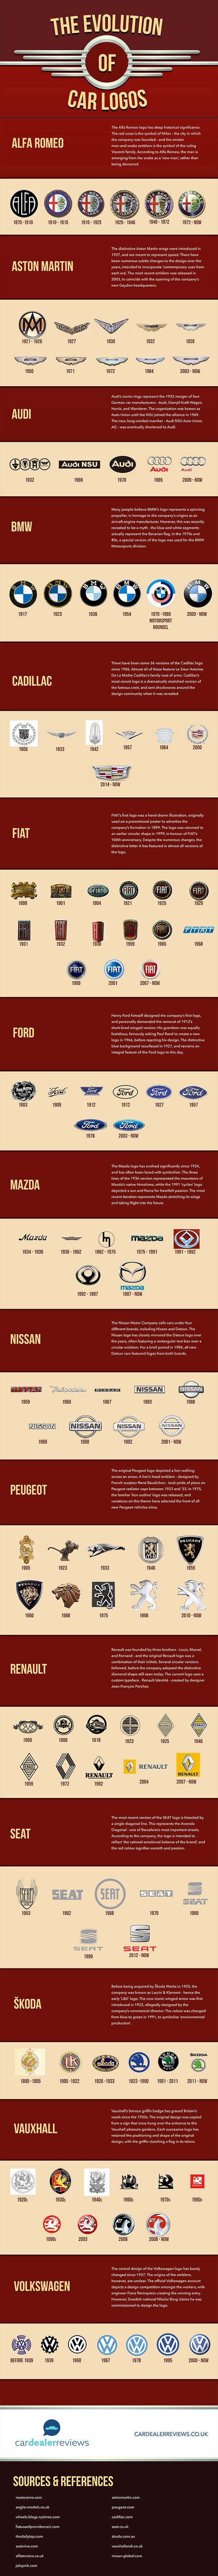 Evolution des logos des grandes marques de voitures.  #Logo #Voiture #Infographie #Graphisme